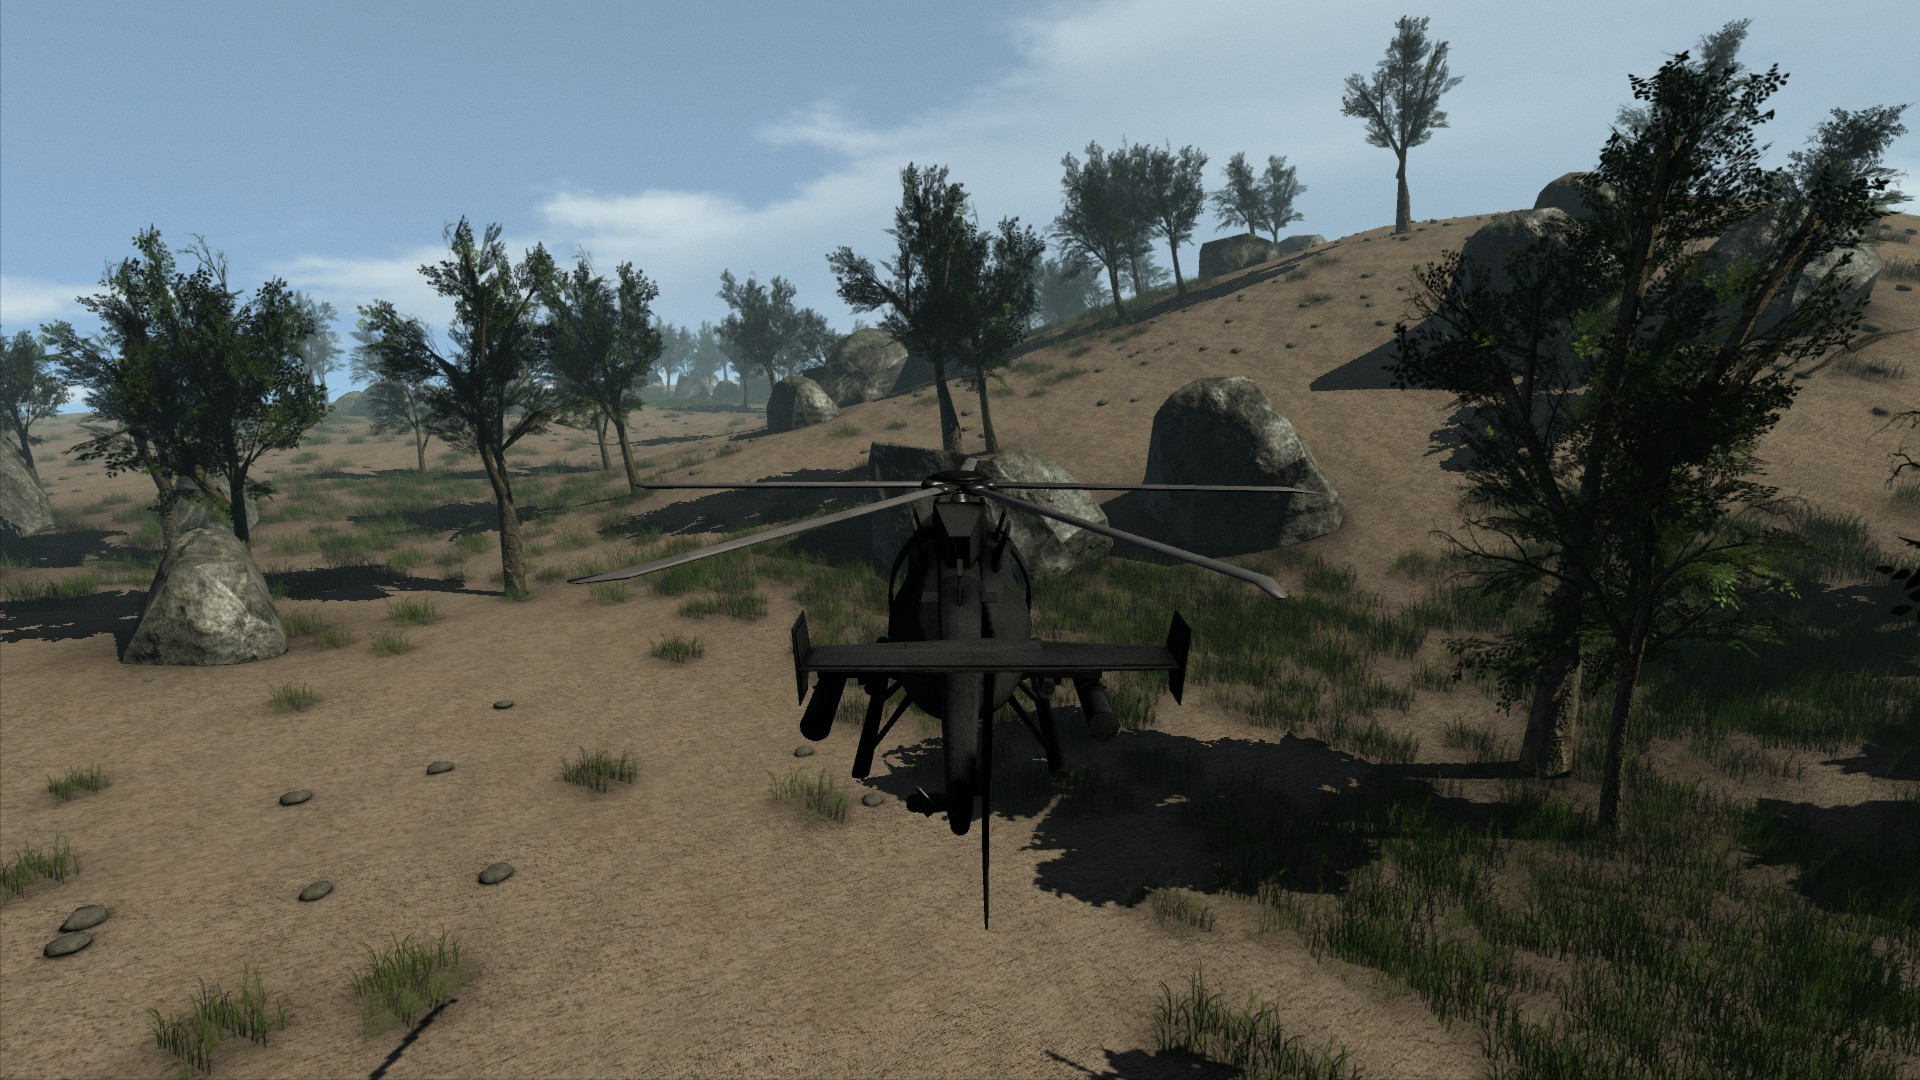 Battlefield ARMA Like Vehicles Download 360 Degree Video